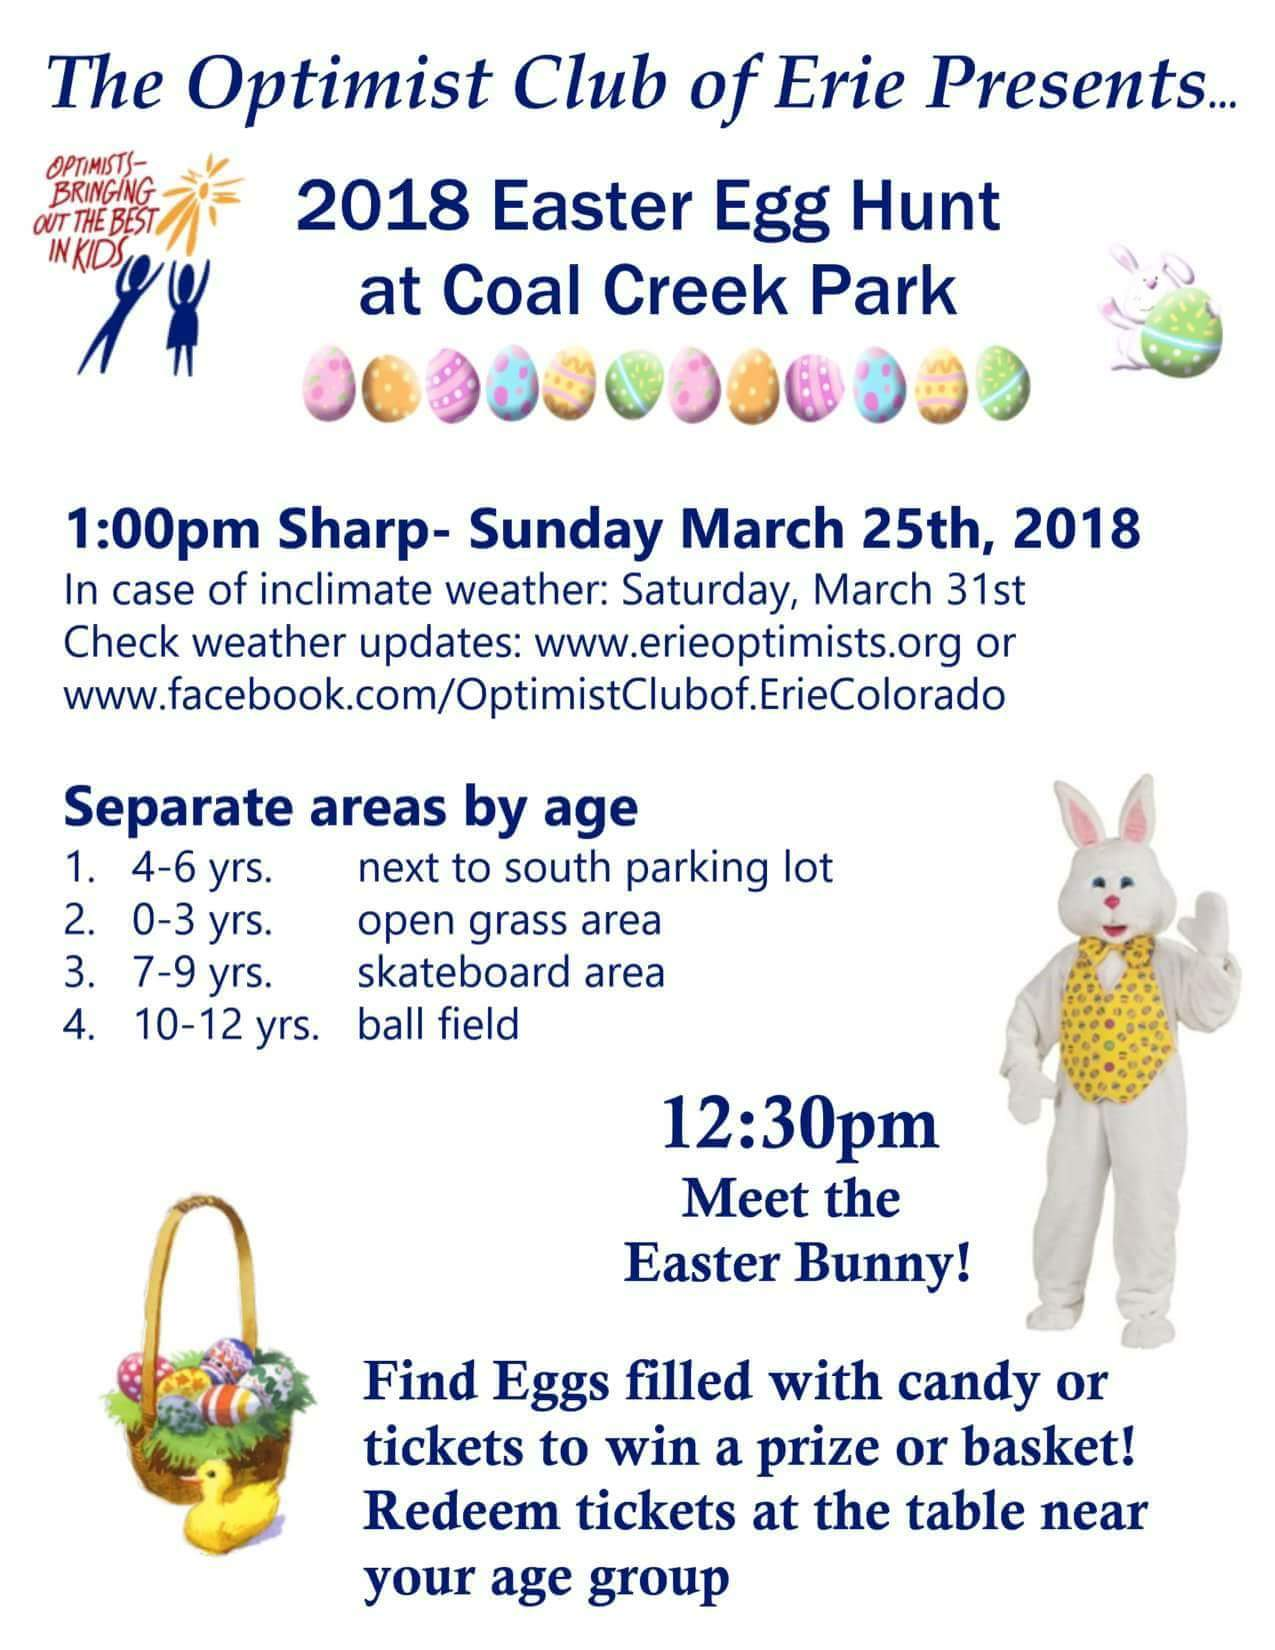 Erie Optimists Egg Hunt 2018